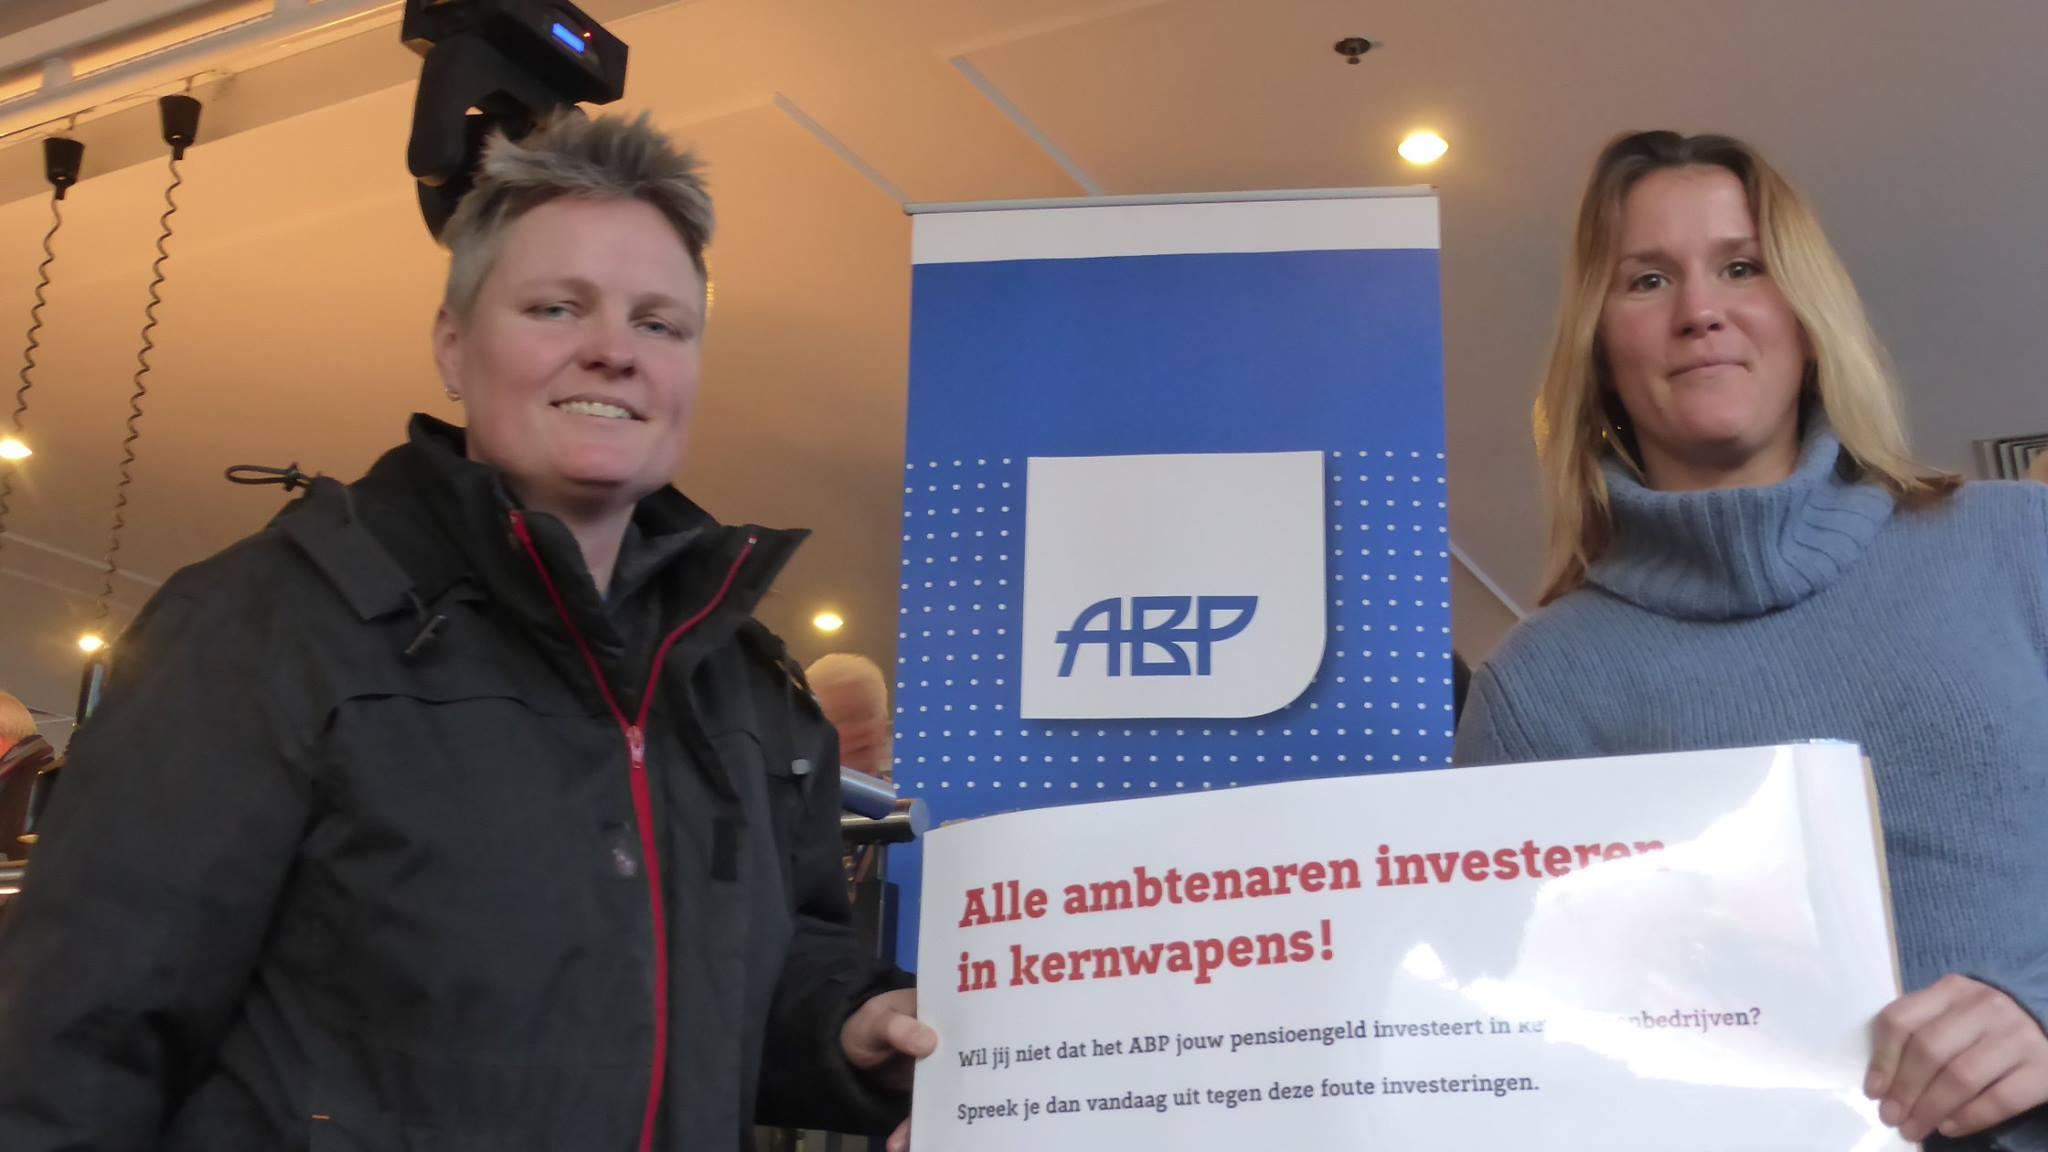 ABP Roermond